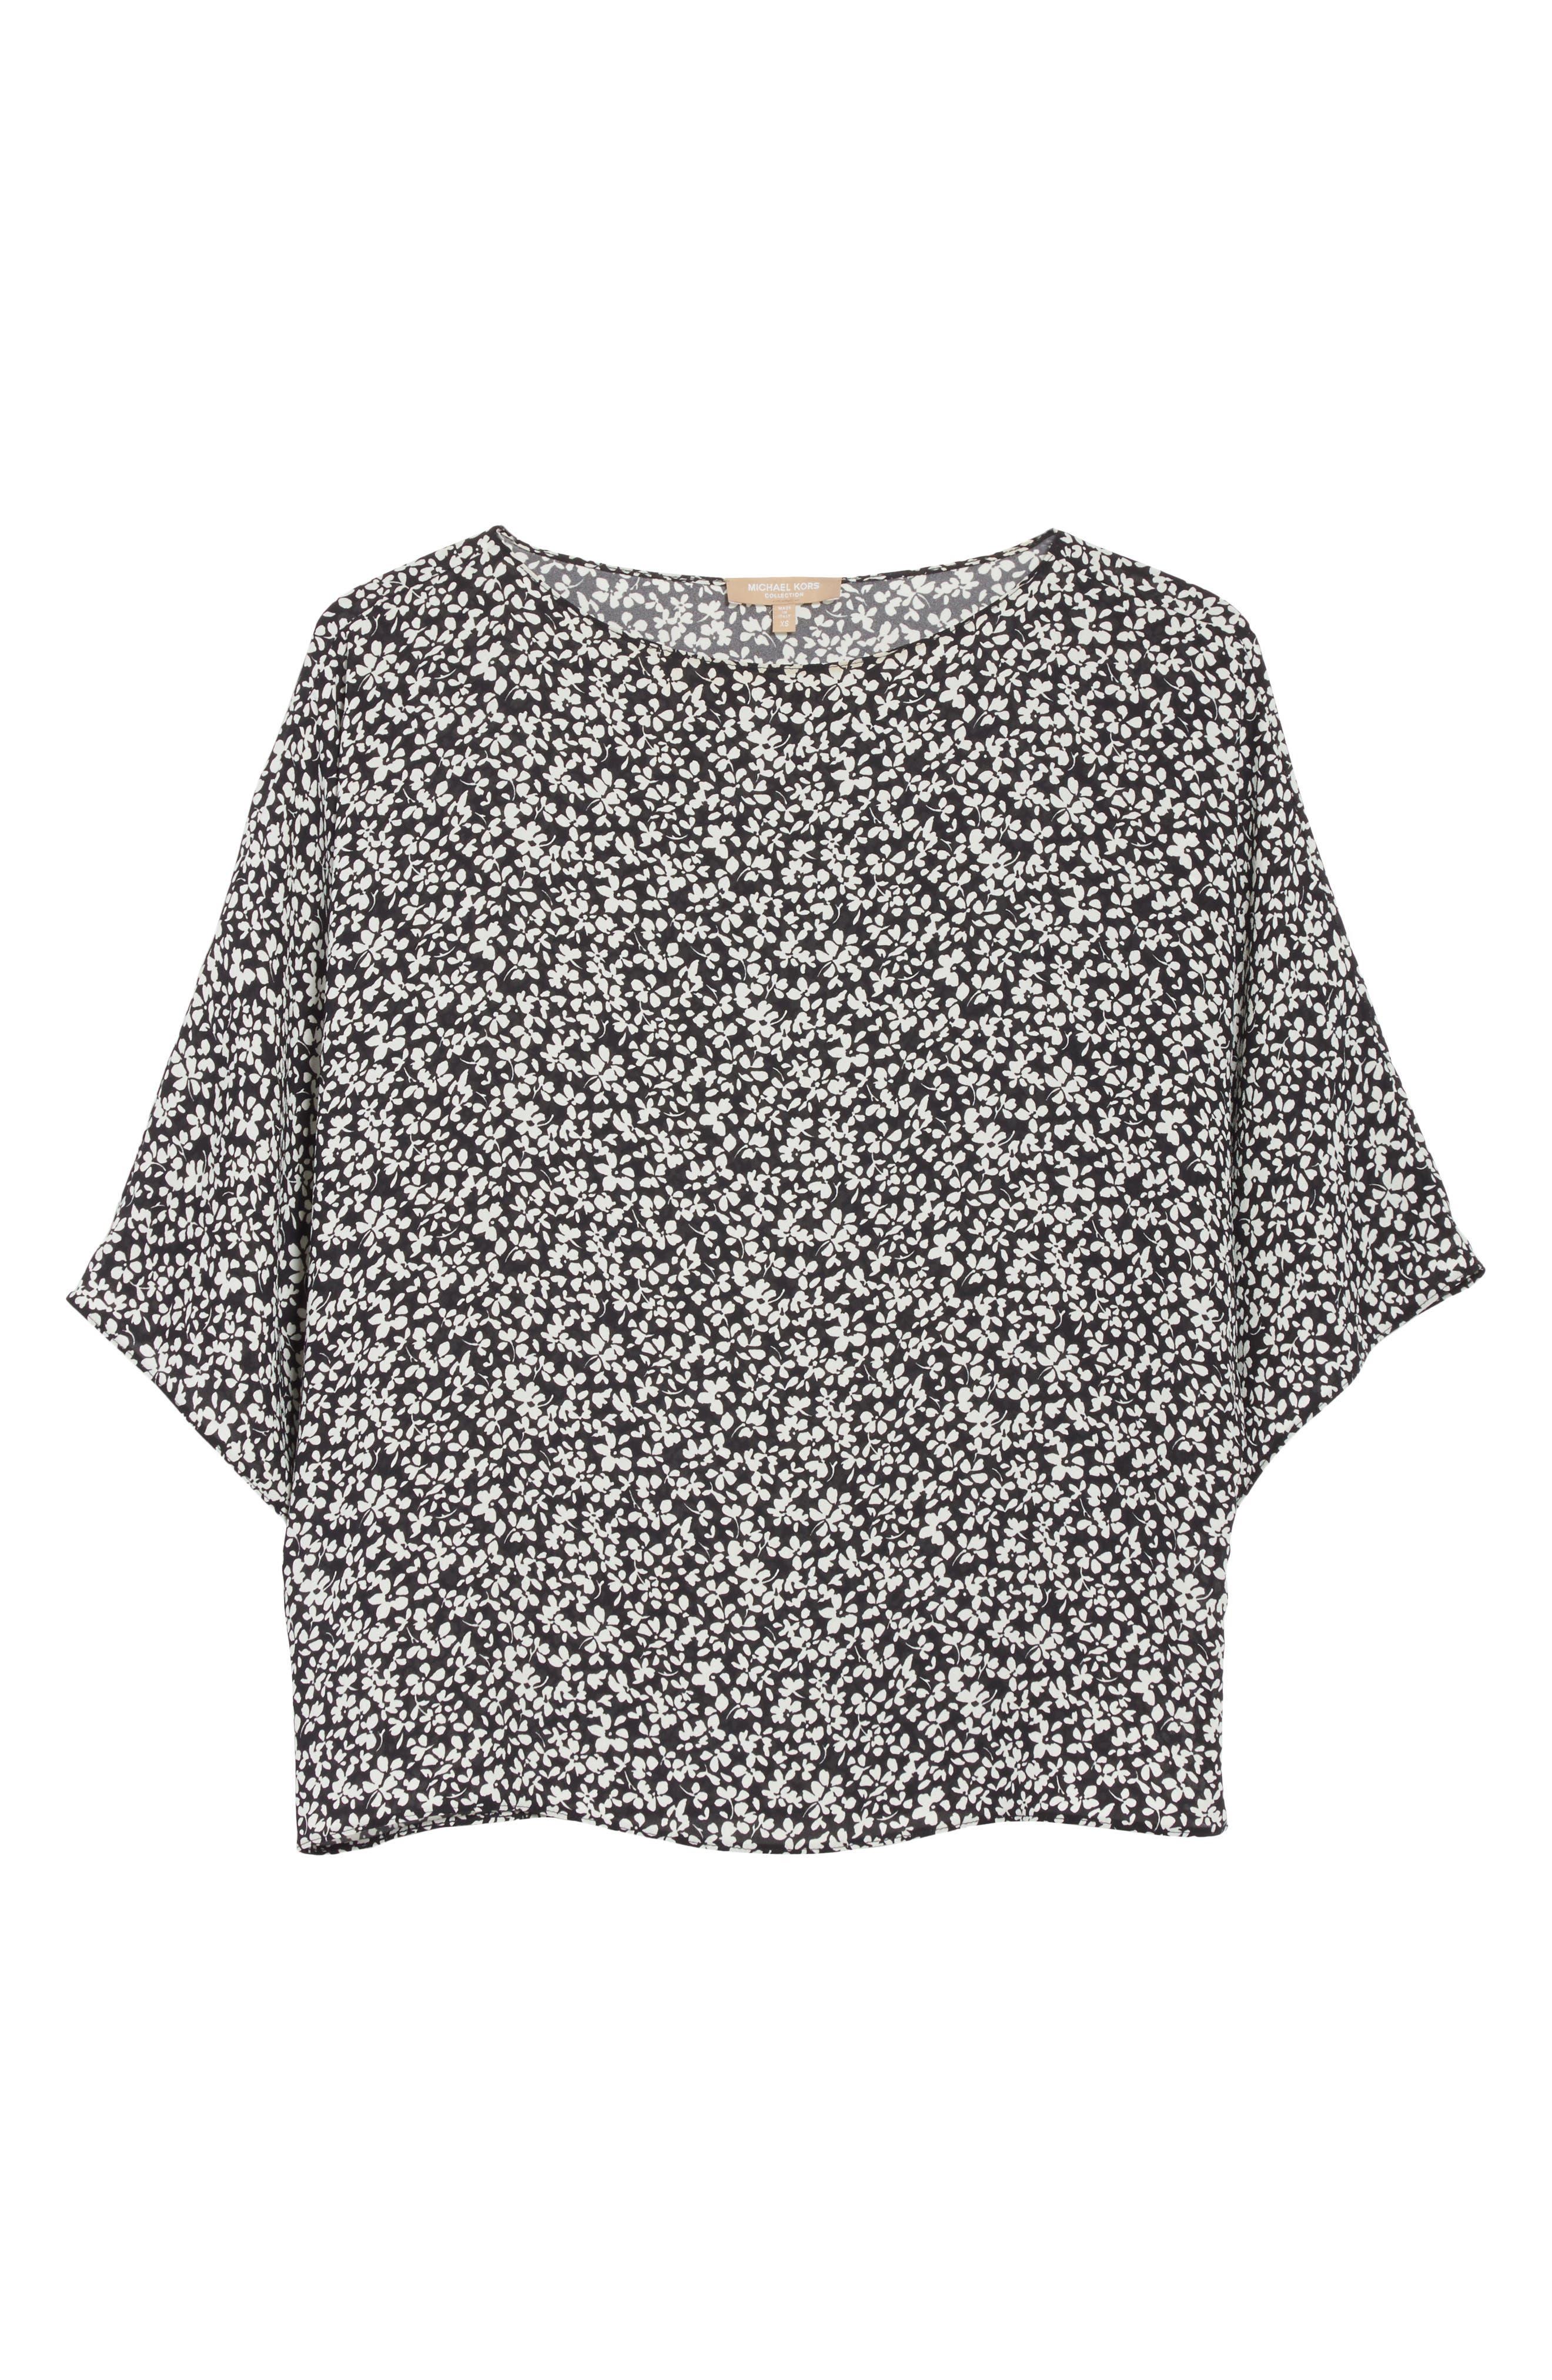 Floral Silk Blouse,                             Alternate thumbnail 7, color,                             Black/White